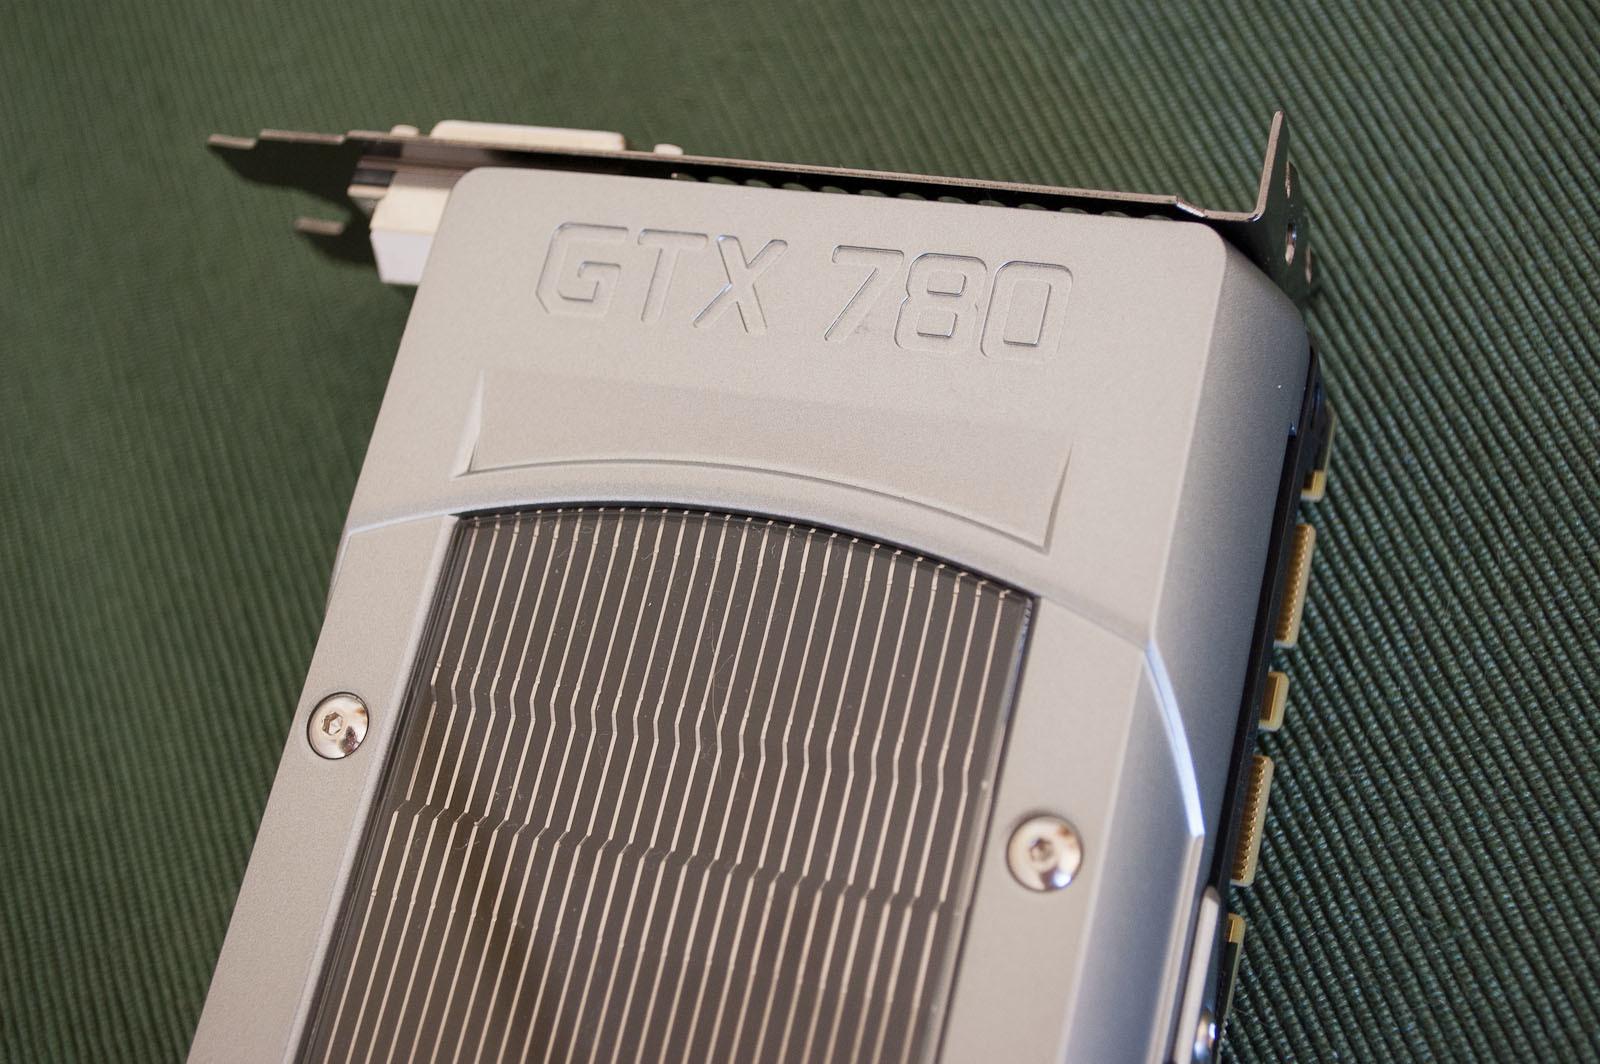 Foto de NVidia GTX 780, análisis (1/15)